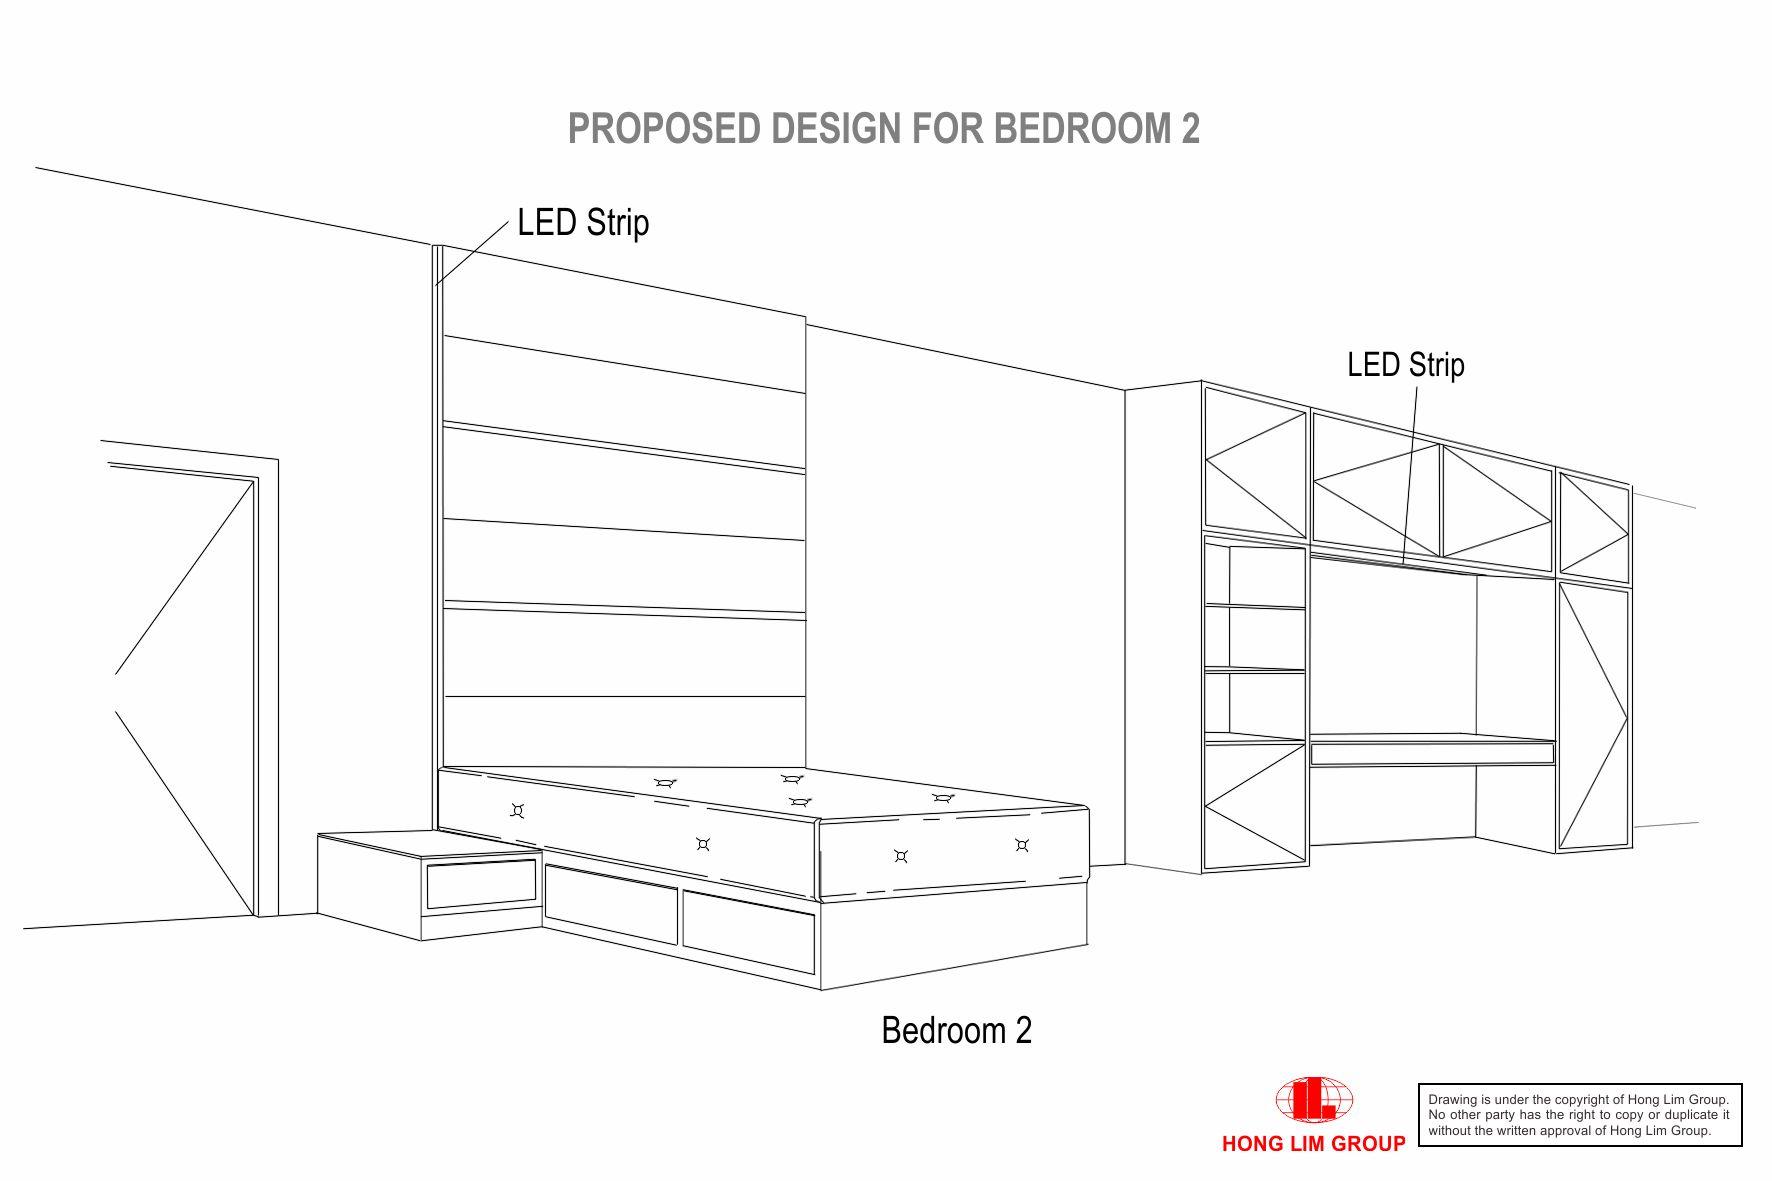 Bedroom 2 amend